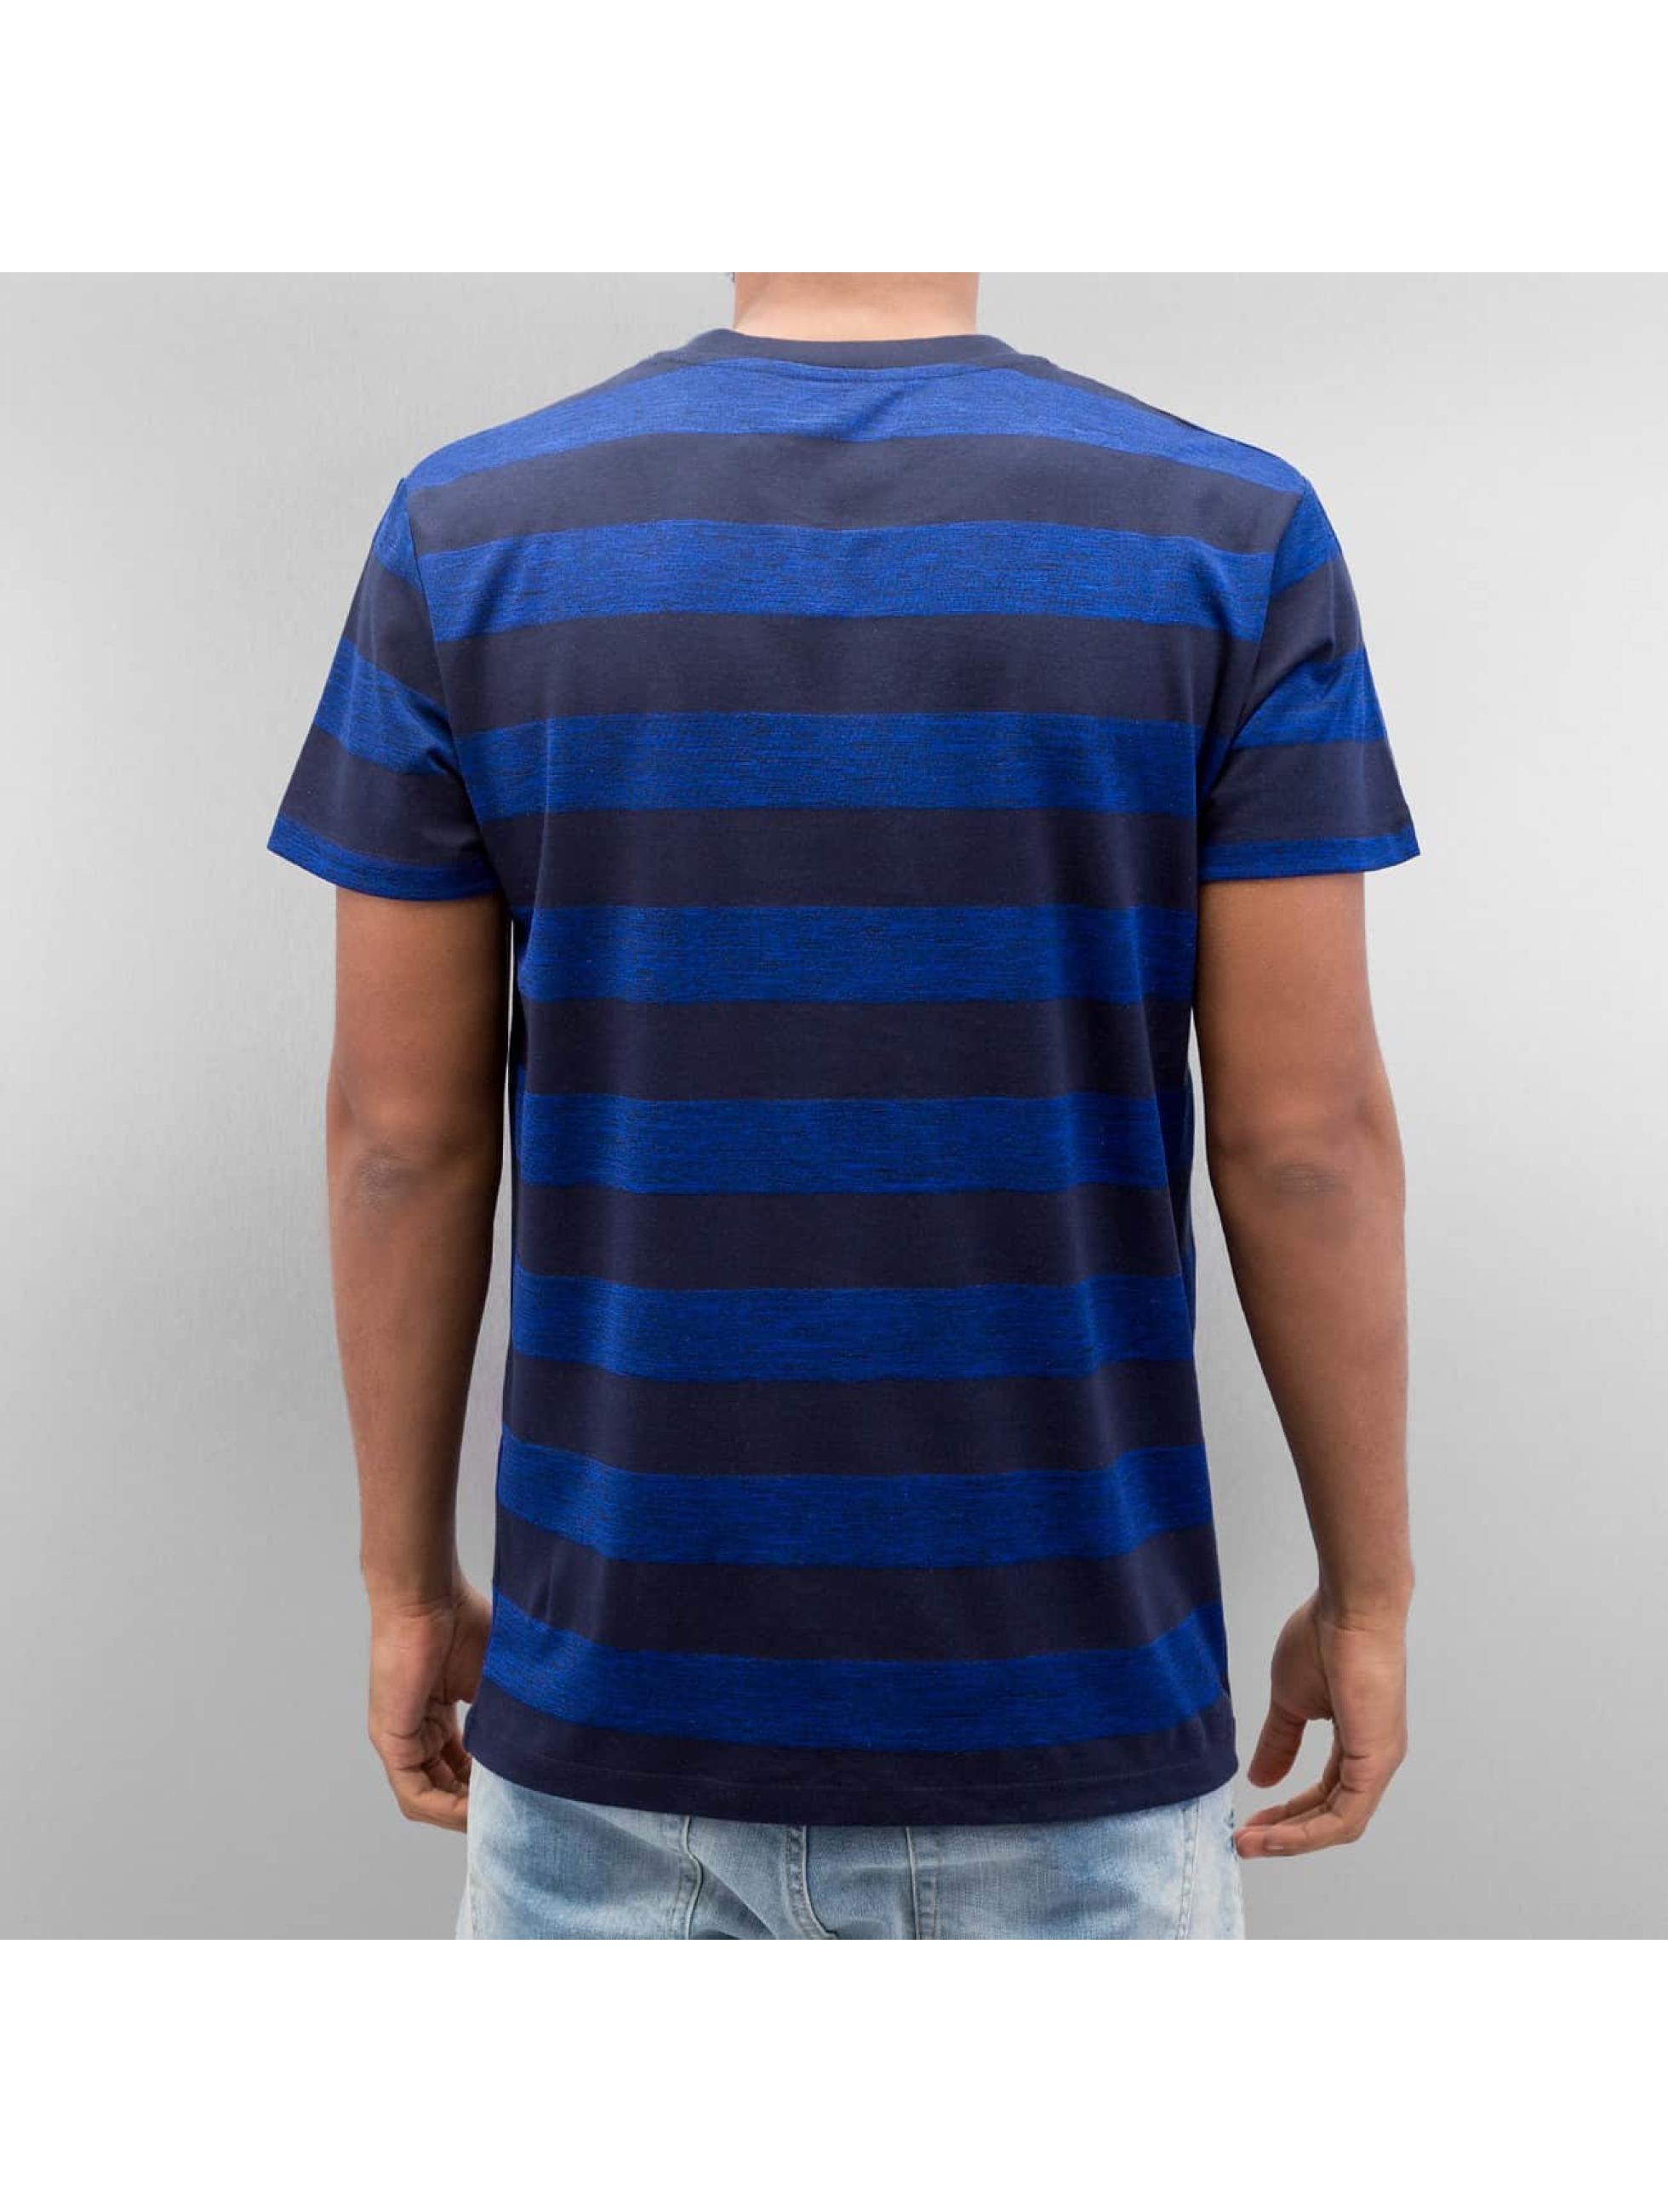 Jack & Jones t-shirt jcoFest blauw